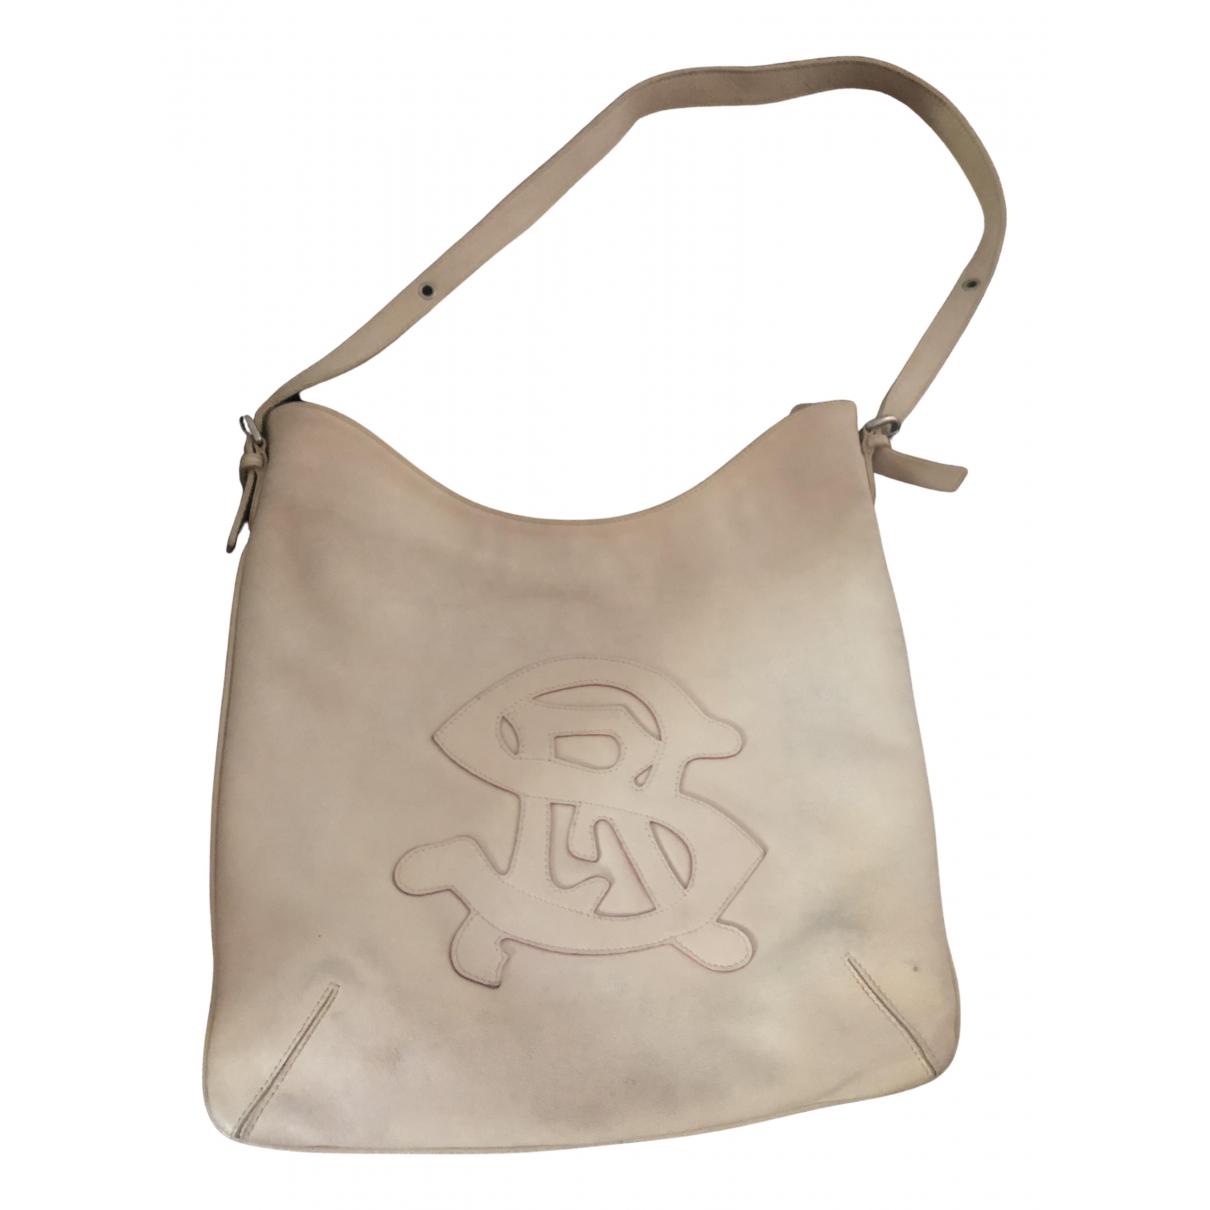 Sonia Rykiel N Beige Leather handbag for Women N